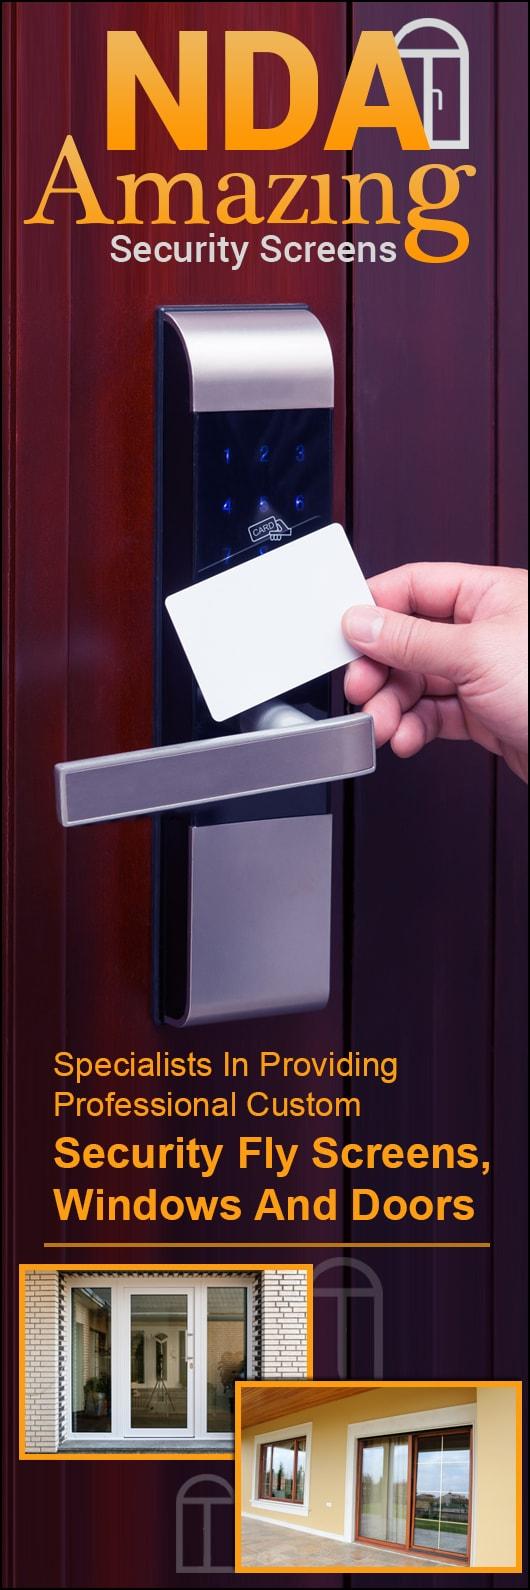 NDA Amazing Security Screens - Promotion & NDA Amazing Security Screens - Security Doors Windows \u0026 Equipment ...